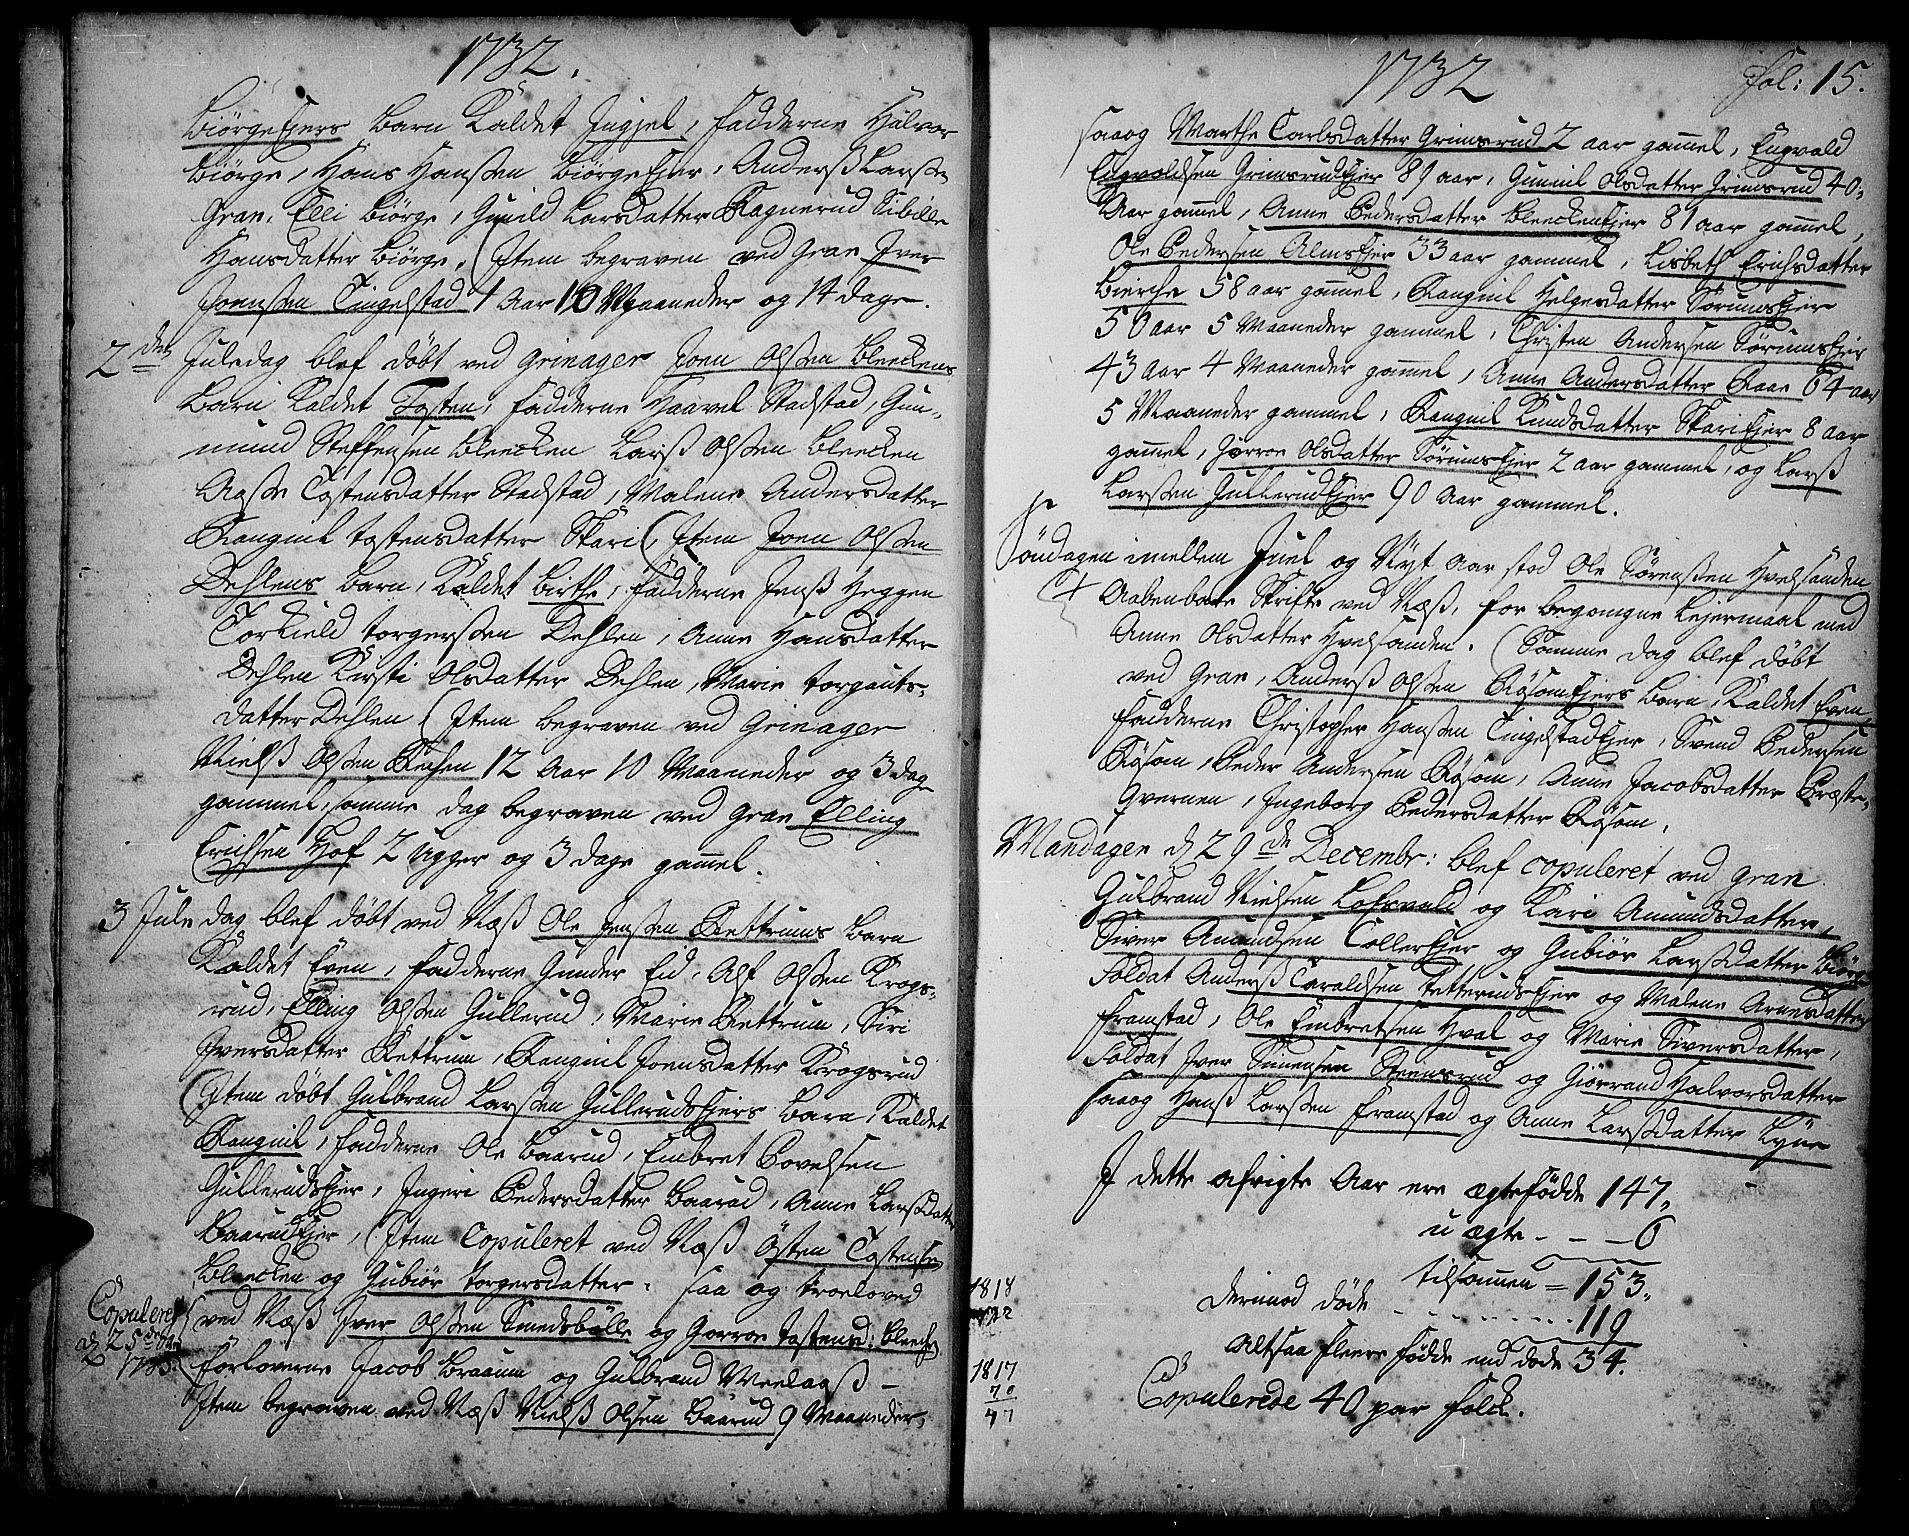 SAH, Gran prestekontor, Ministerialbok nr. 2, 1732-1744, s. 15